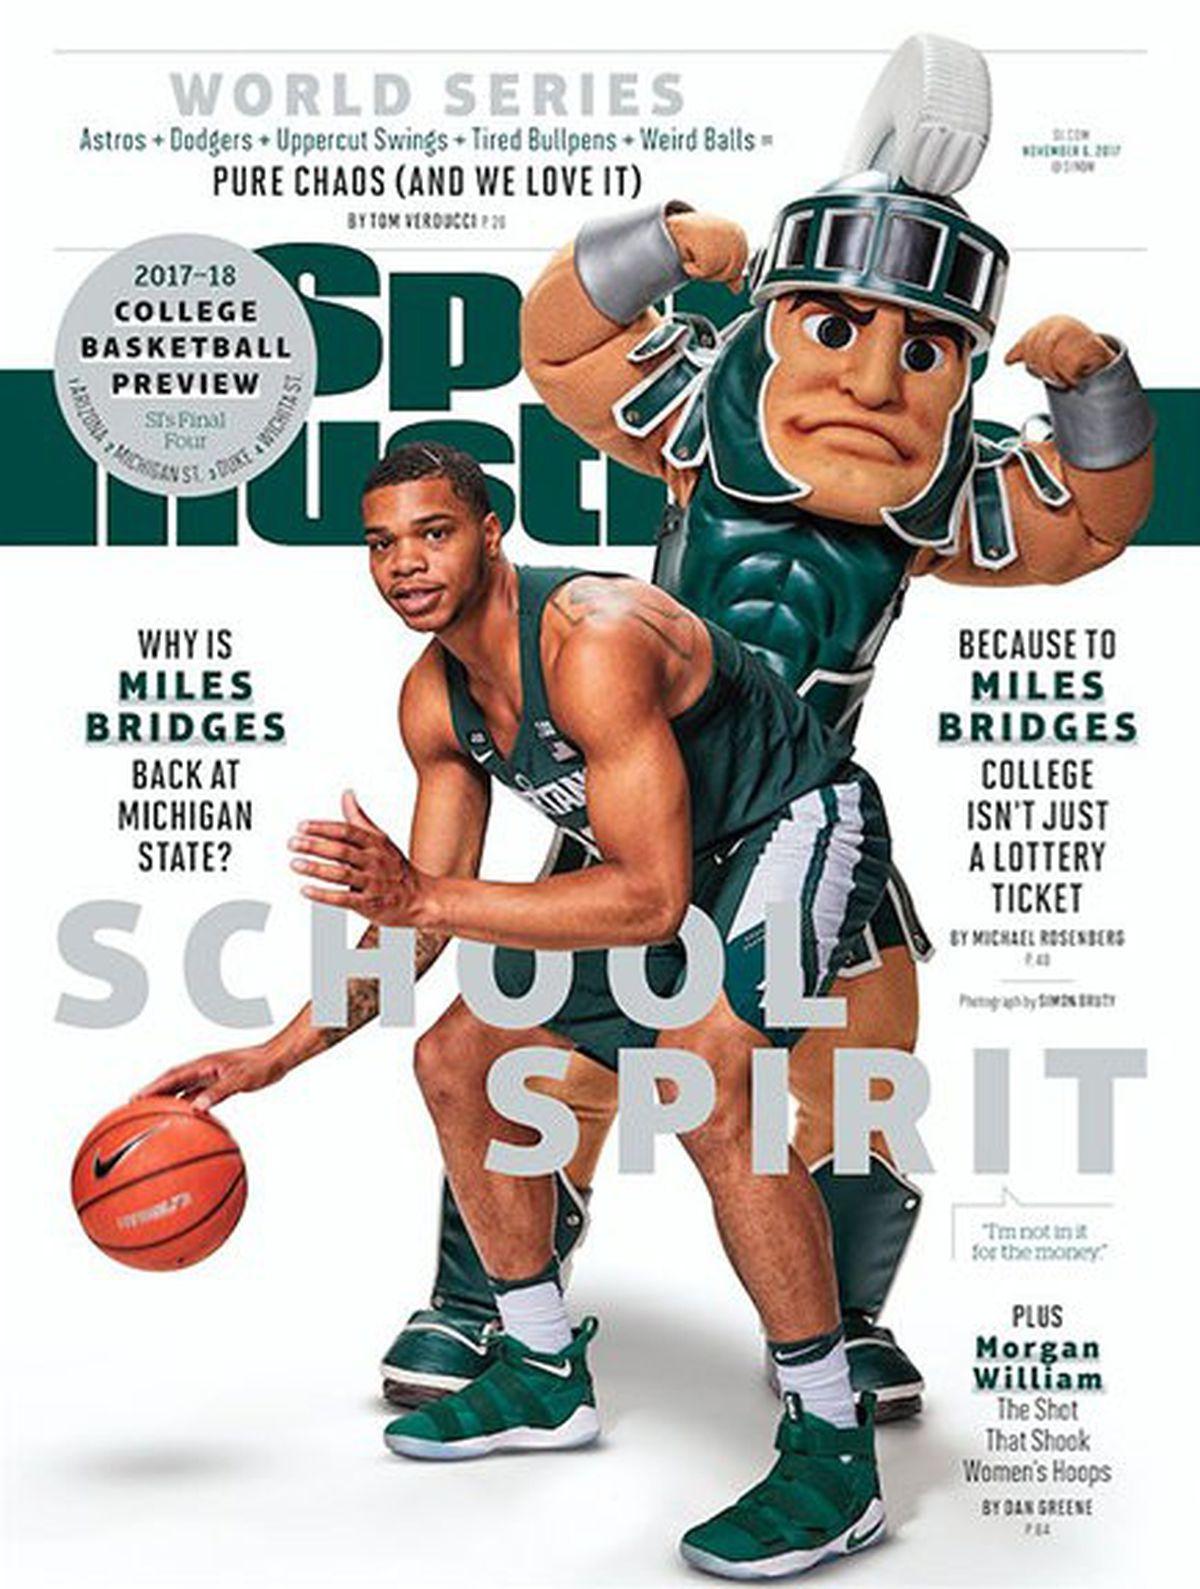 Beware The Si Cover Jinx Michigan S Pro College Teams Have A In 2020 Michigan State Basketball Michigan State Michigan State Spartans Basketball